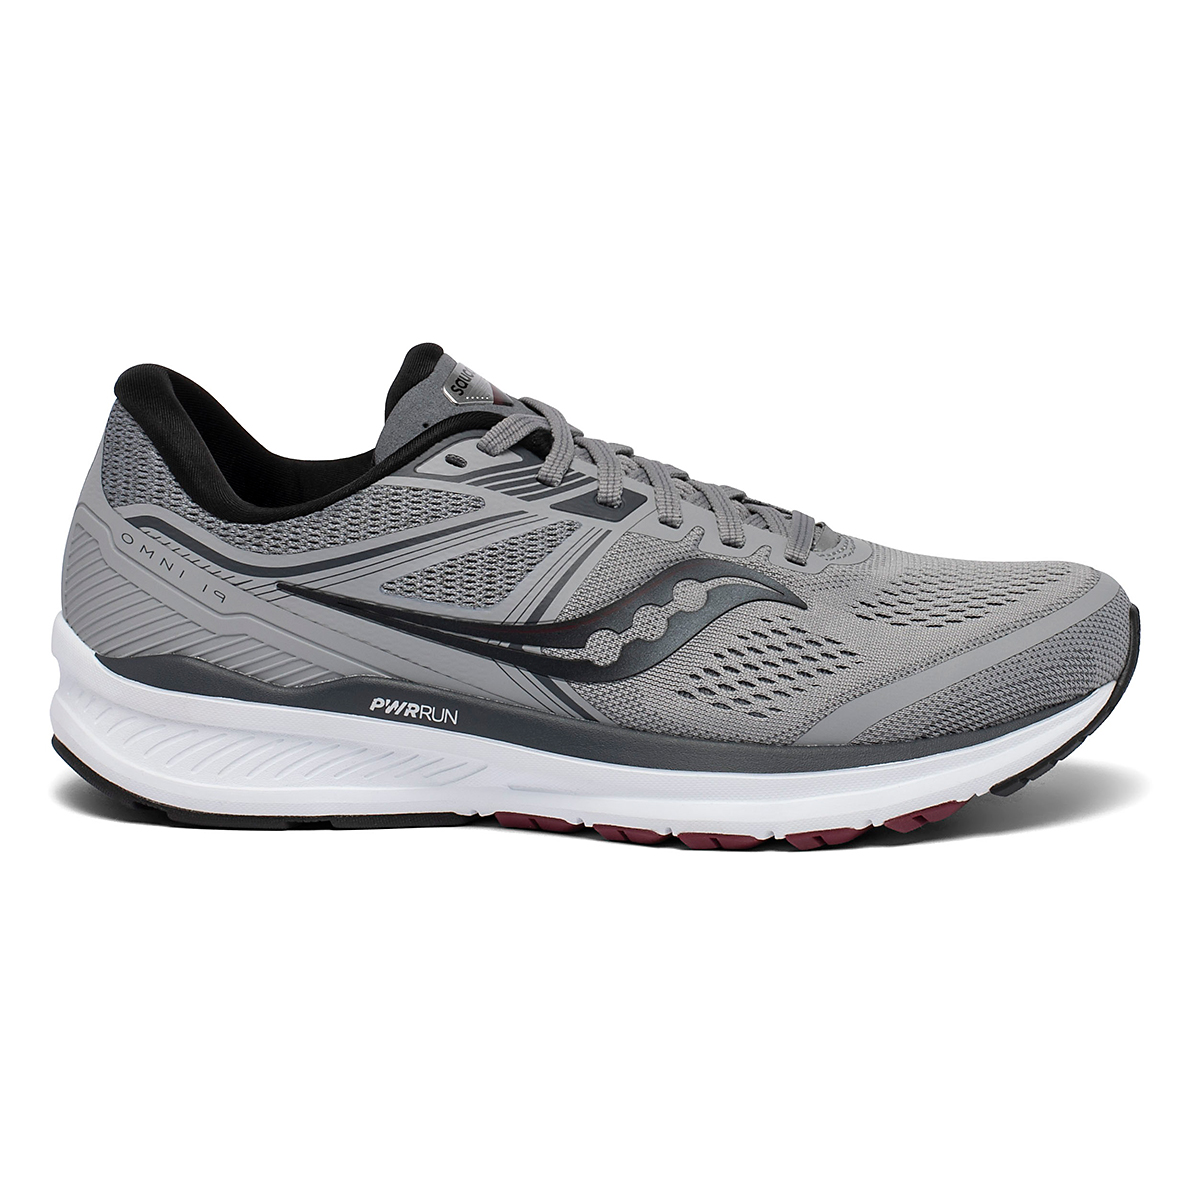 Men's Saucony Omni 19 Walking Shoe - Color: Alloy/Brick - Size: 7 - Width: Wide, Alloy/Brick, large, image 1